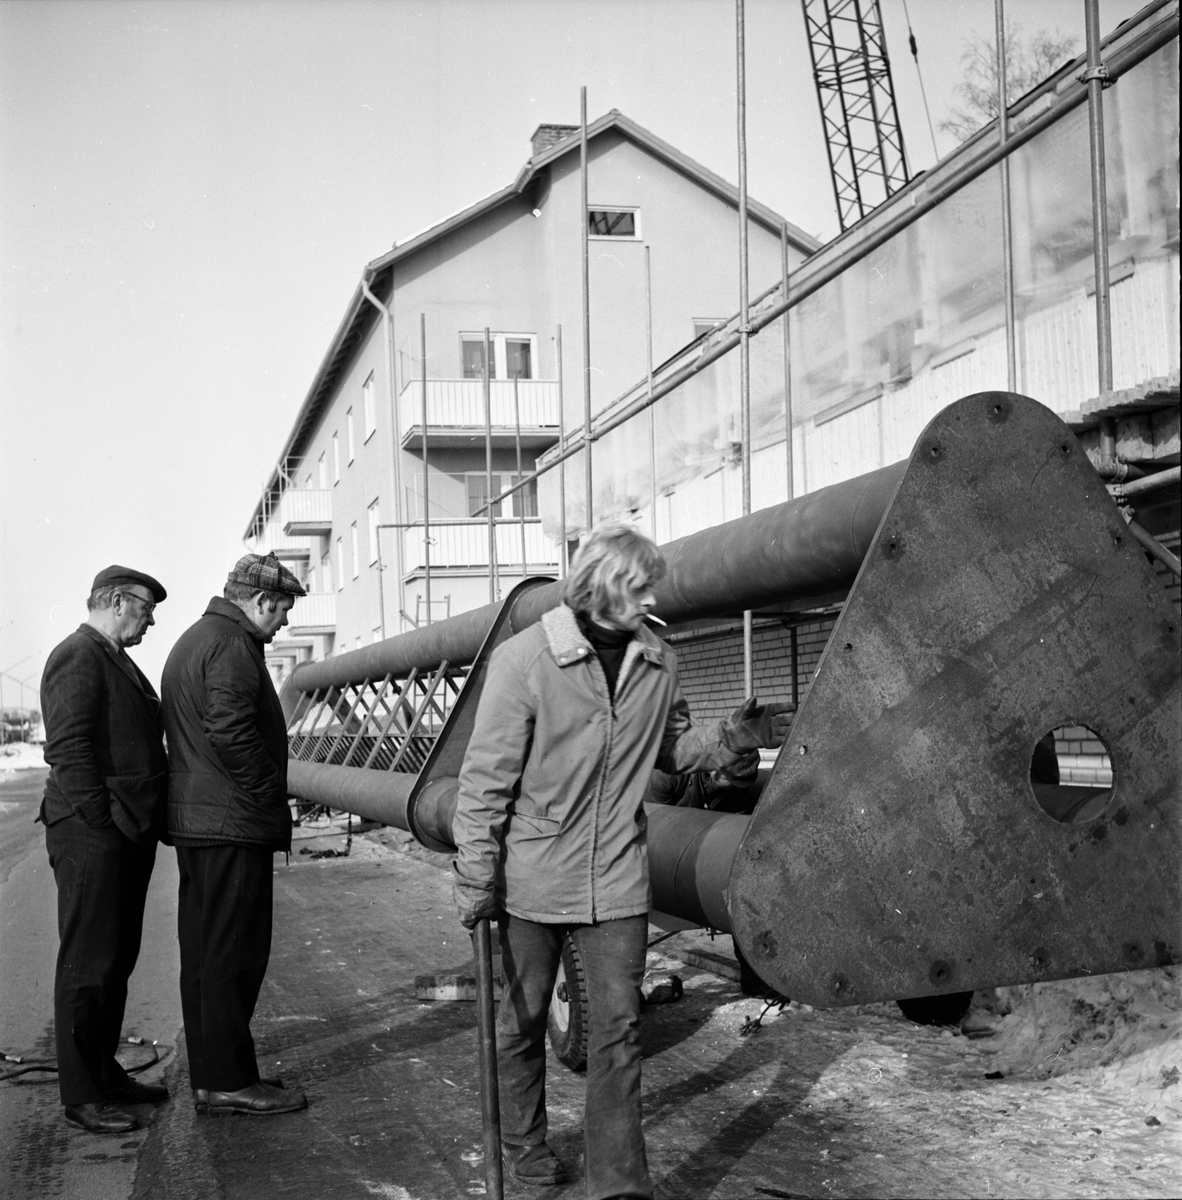 Hallbygge i Arbrå, Skorstenen på nya Hälsinge Livs reses, Mars 1972